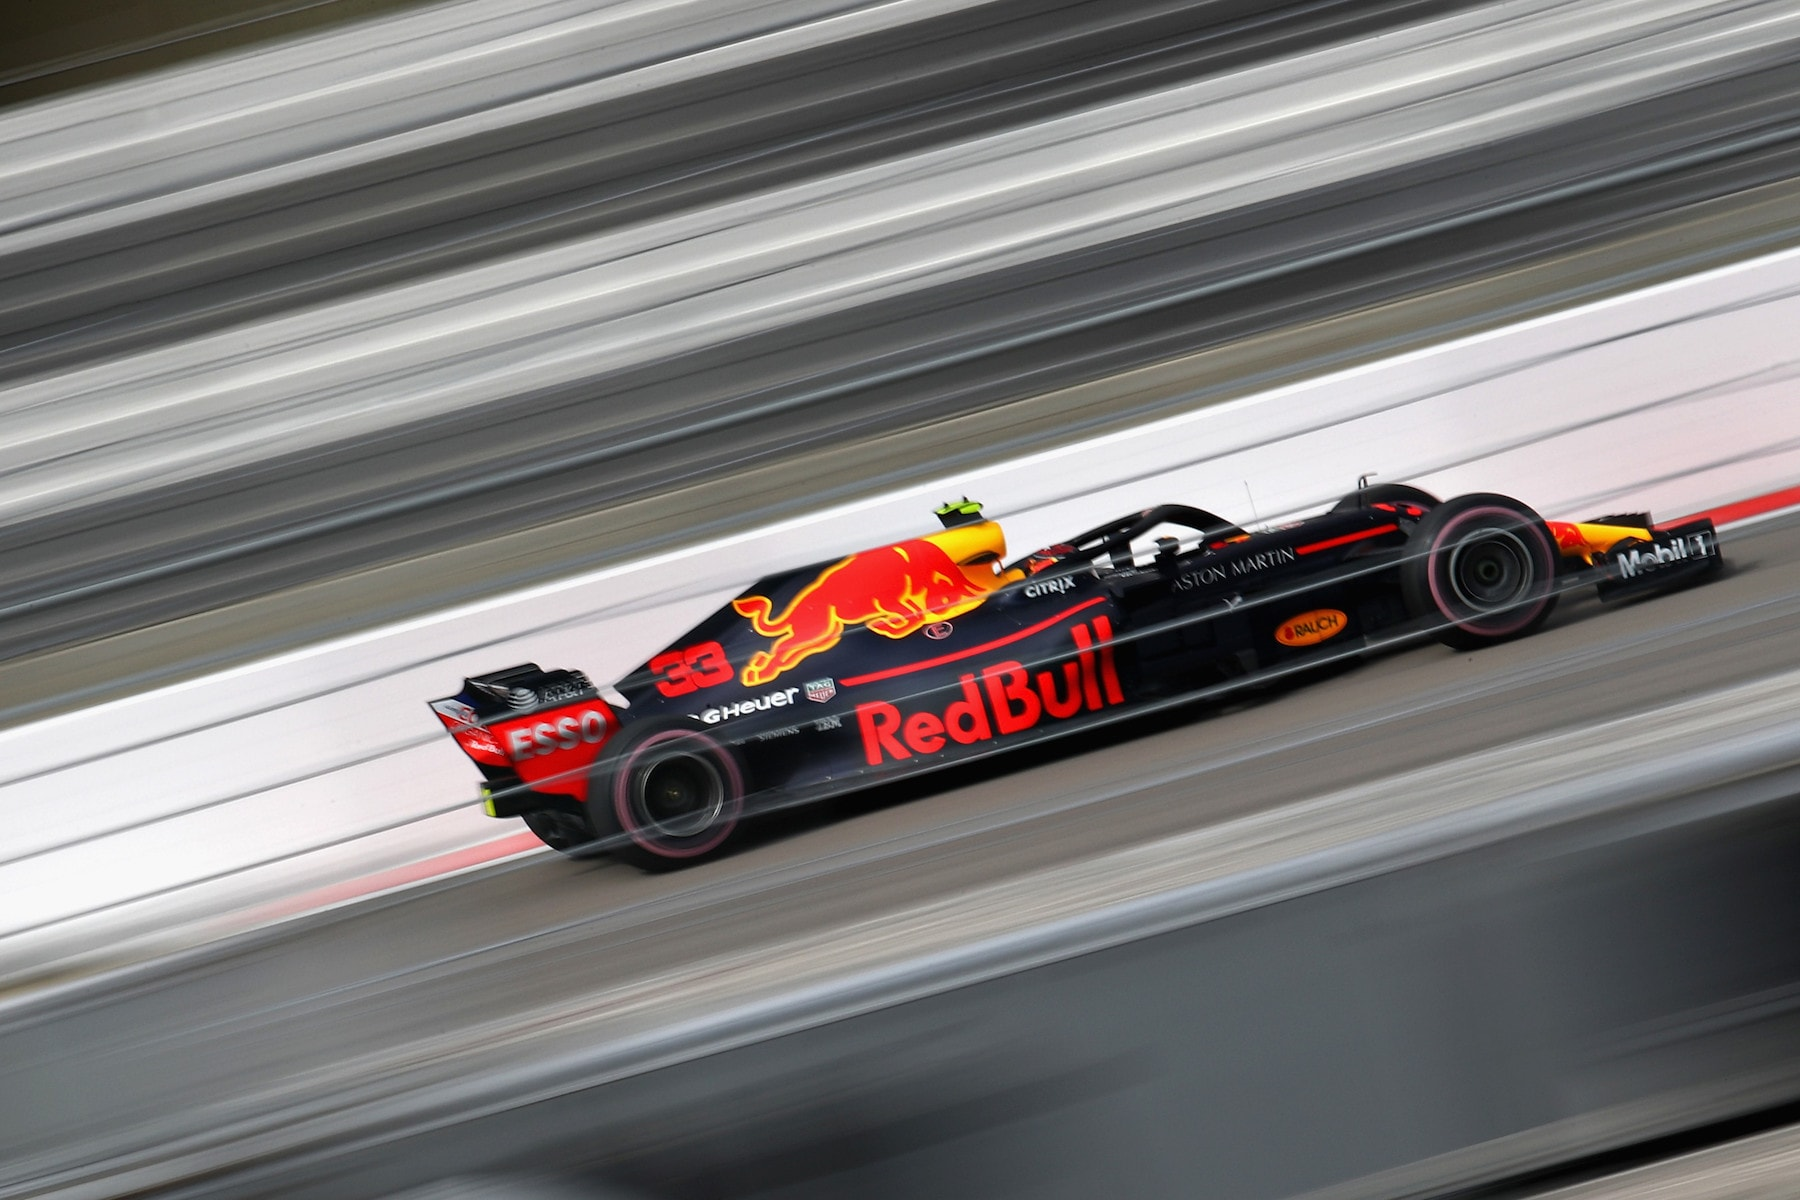 2018 Max Verstappen | Red Bull RB14 | 2018 Russian GP FP1 1 copy.jpg